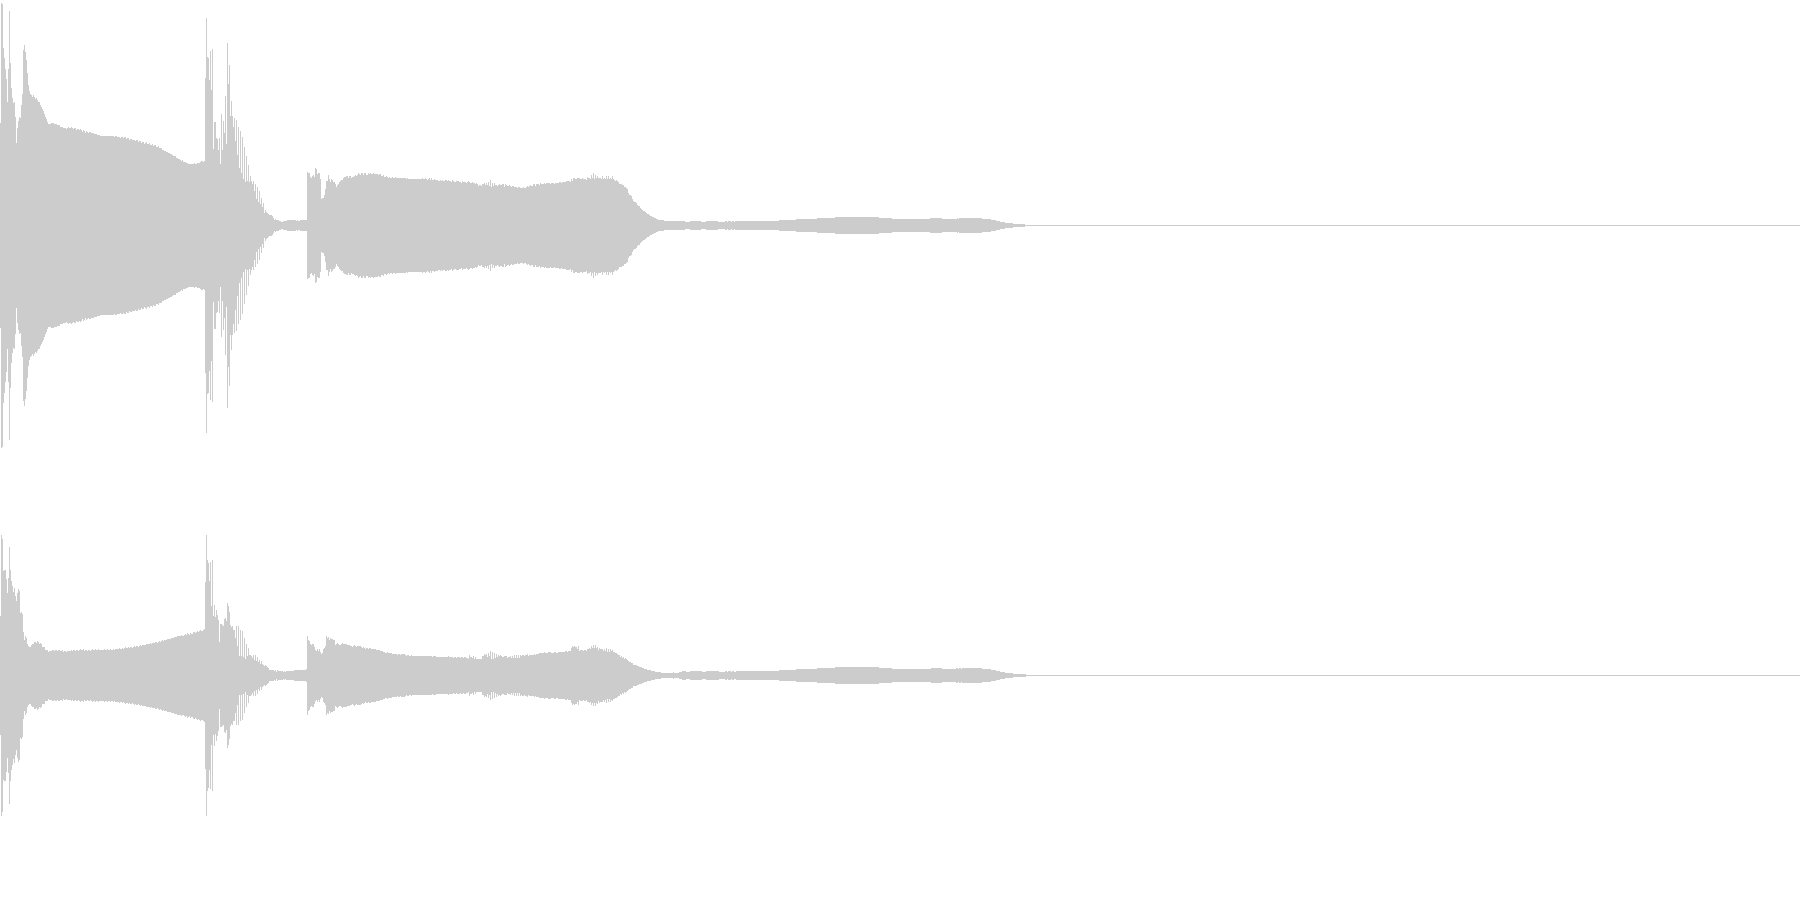 Crystal ロゴ 硬質 透明 電気的の未再生の波形